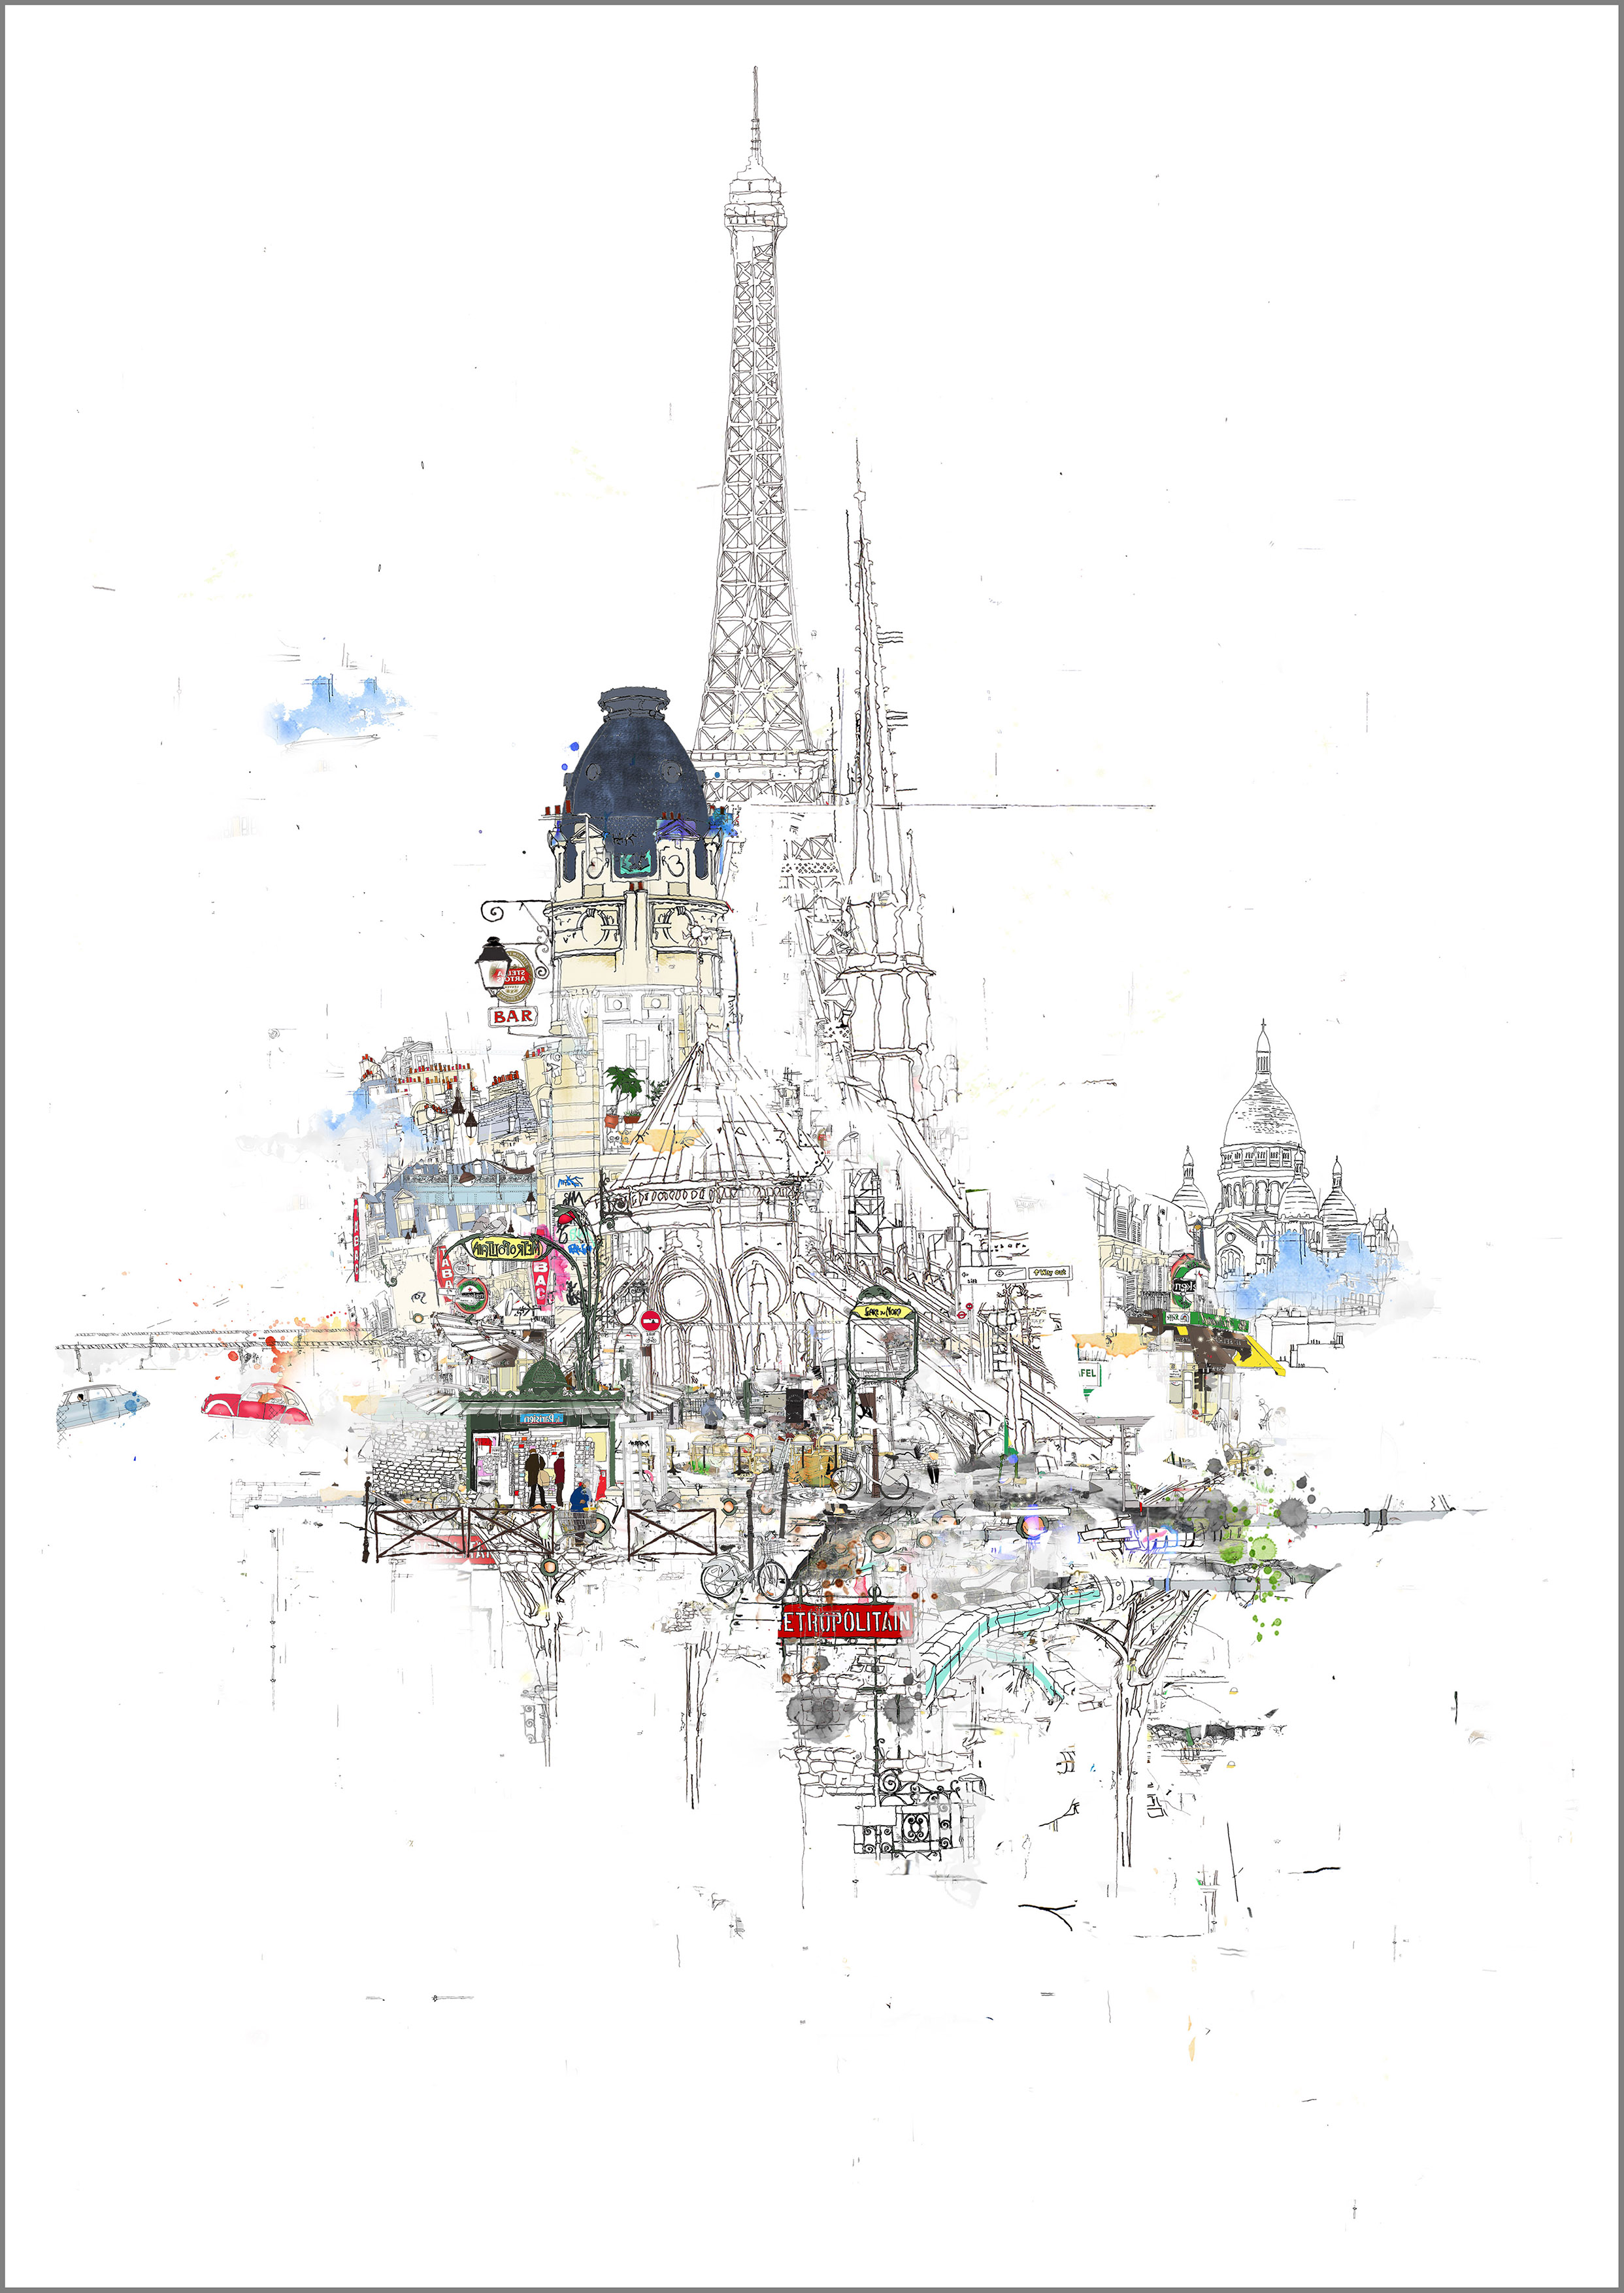 Laura Jordan Notre Dame (unframed)